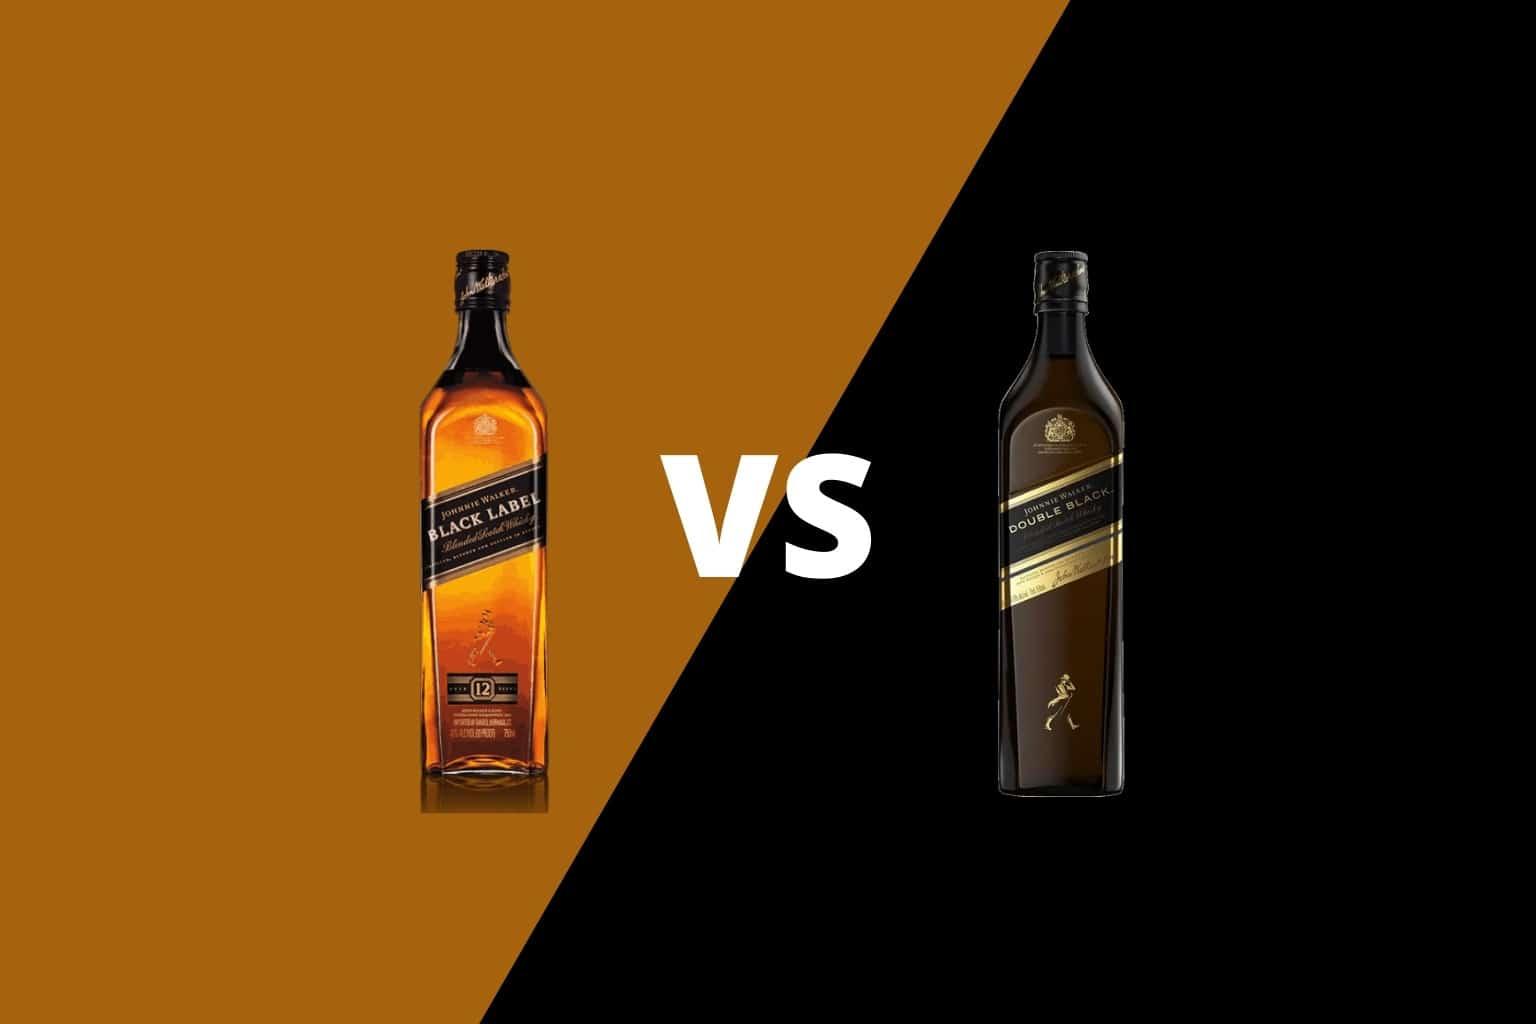 Johnnie Walker Black vs Double Black